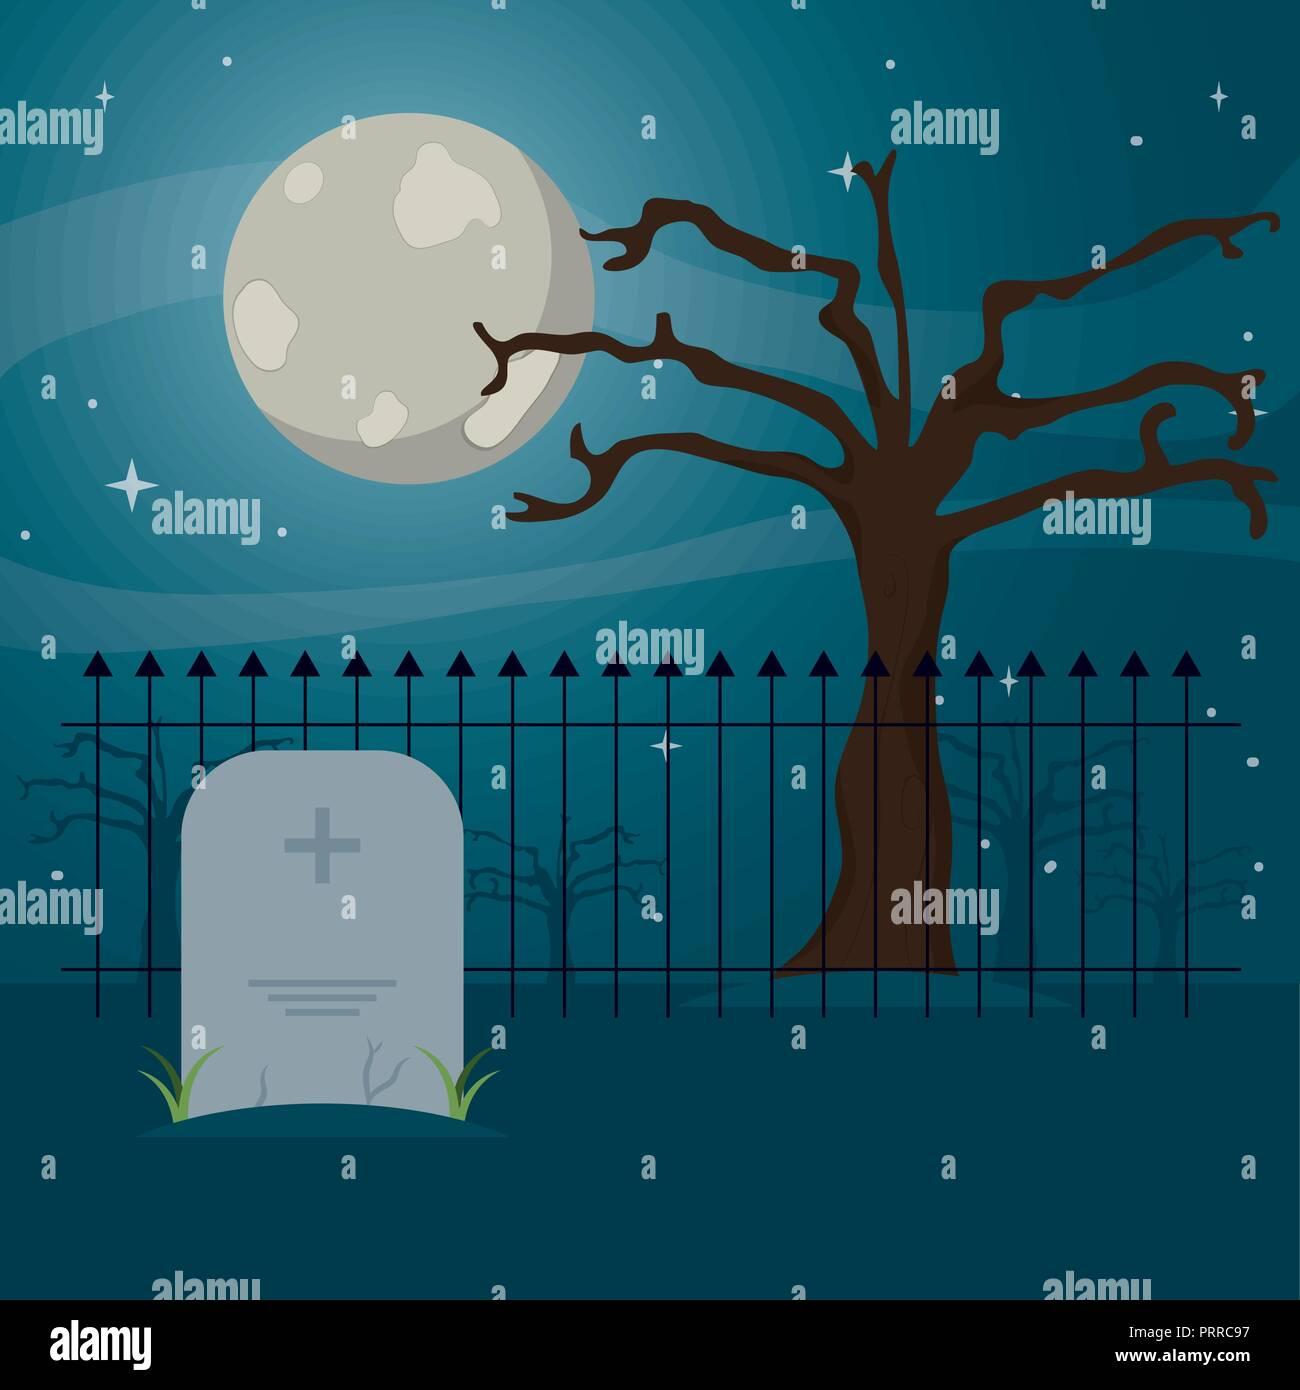 cemetery icon design - Stock Vector